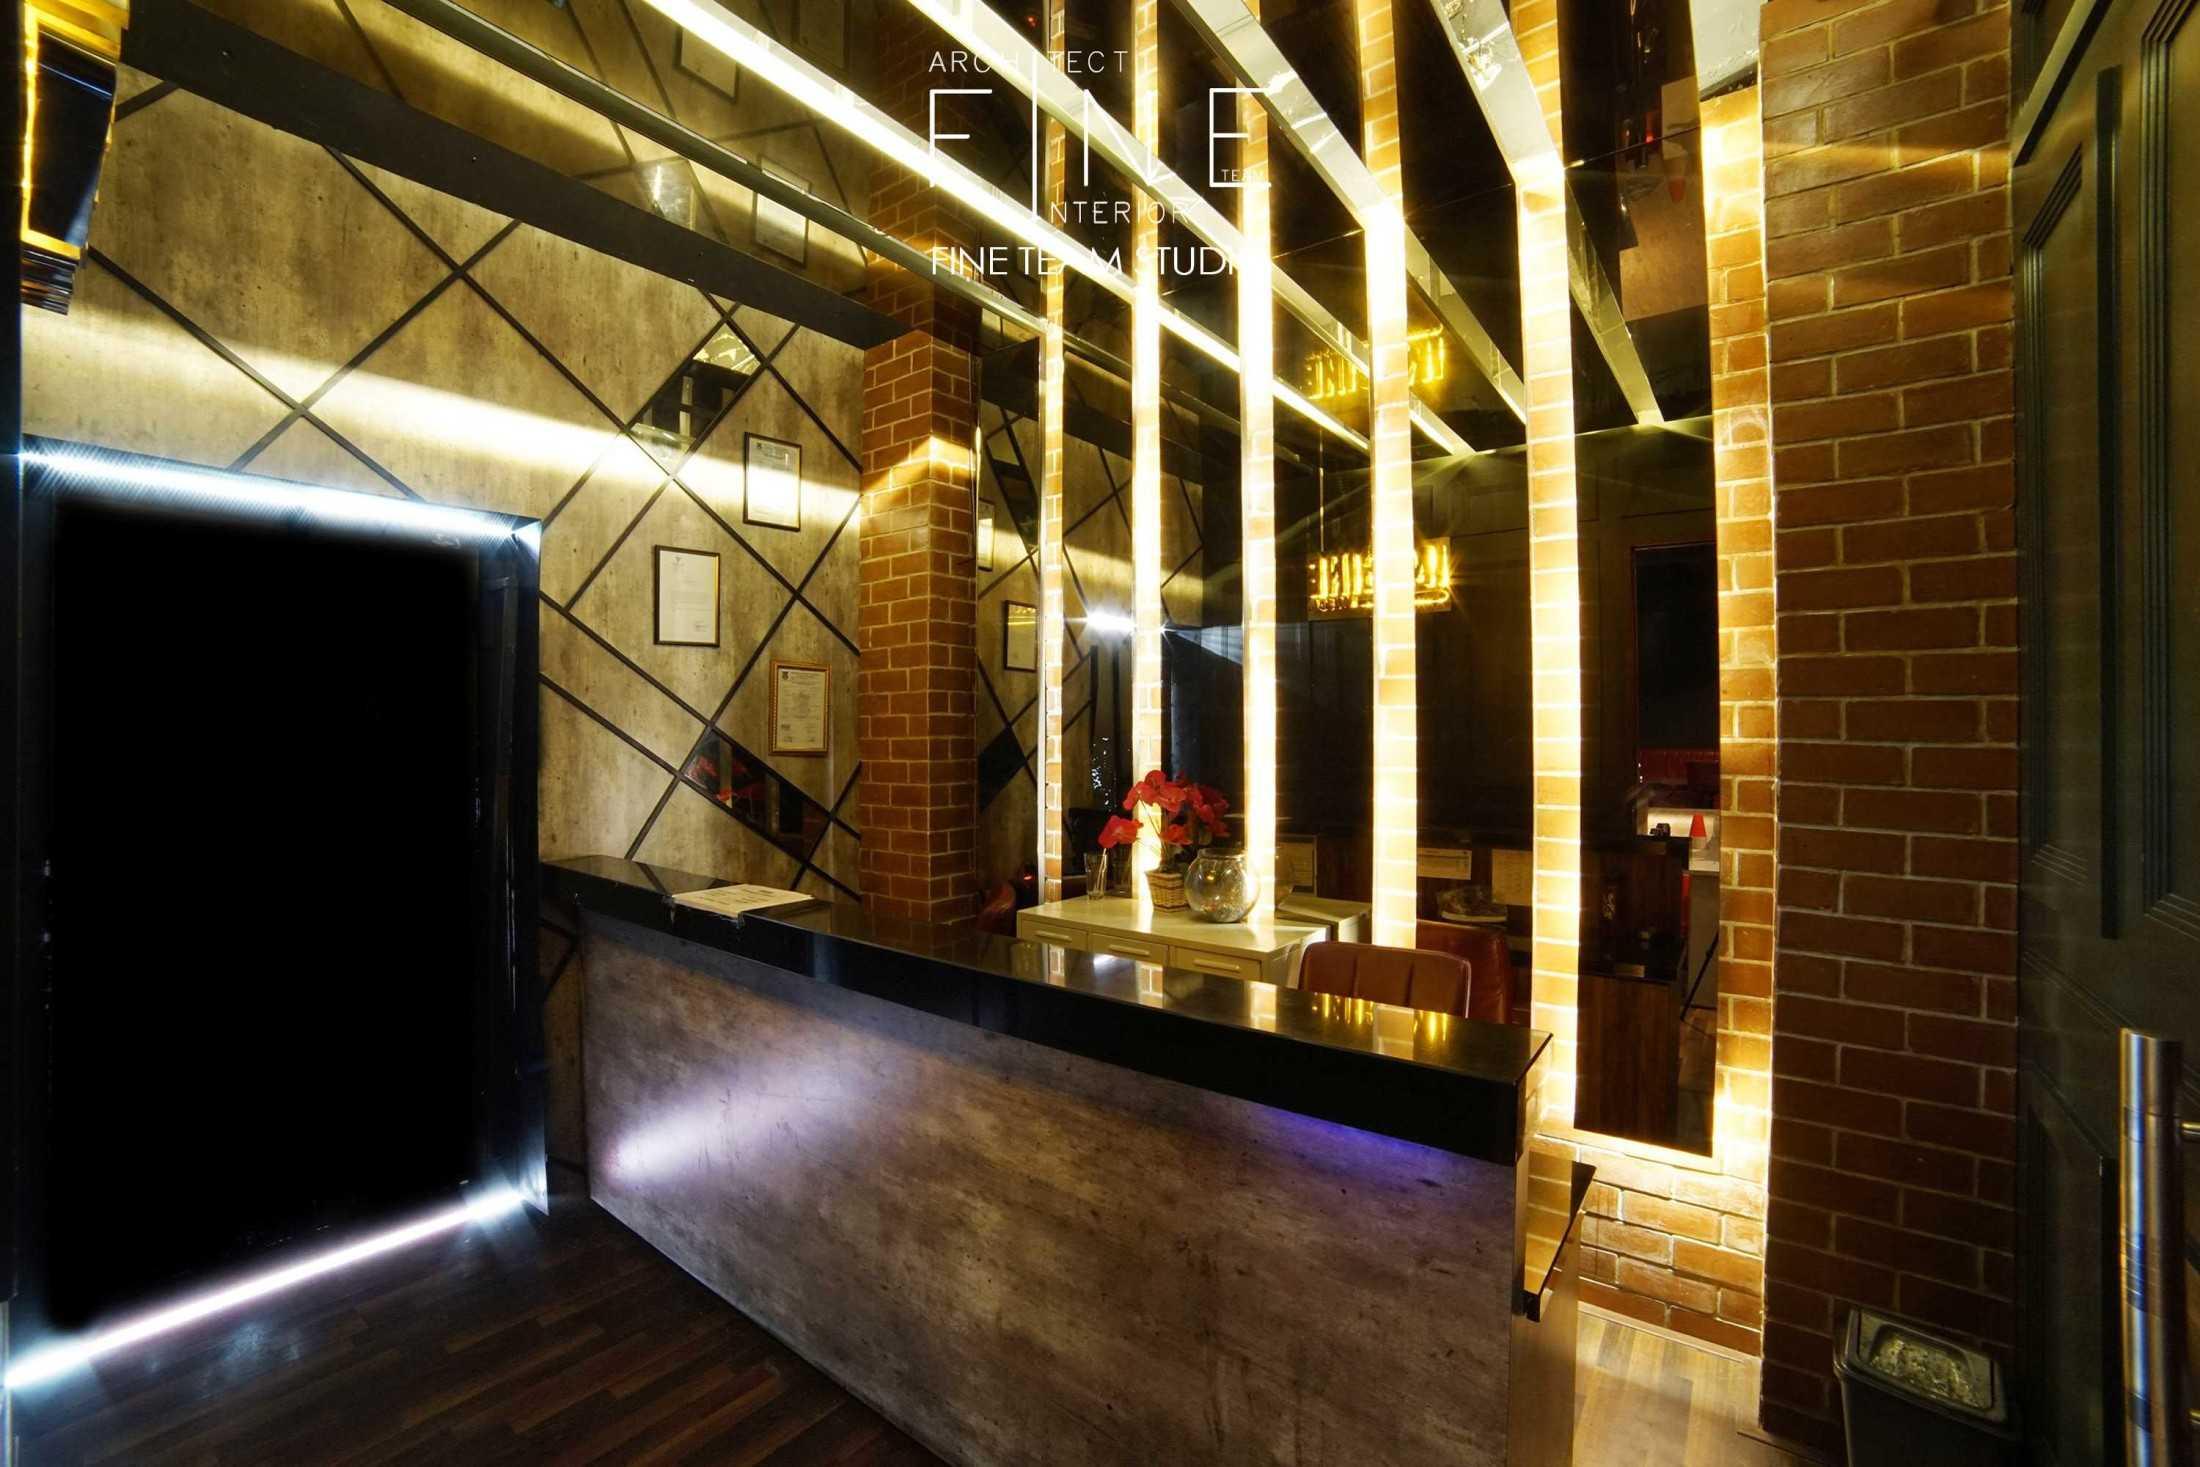 Fine Team Studio Imagine Bar & Lounge Jl. Boulevard Raya Gading Serpong, Klp. Dua, Tangerang, Banten 15810, Indonesia Jl. Boulevard Raya Gading Serpong, Klp. Dua, Tangerang, Banten 15810, Indonesia Interior Bar Kontemporer 53361